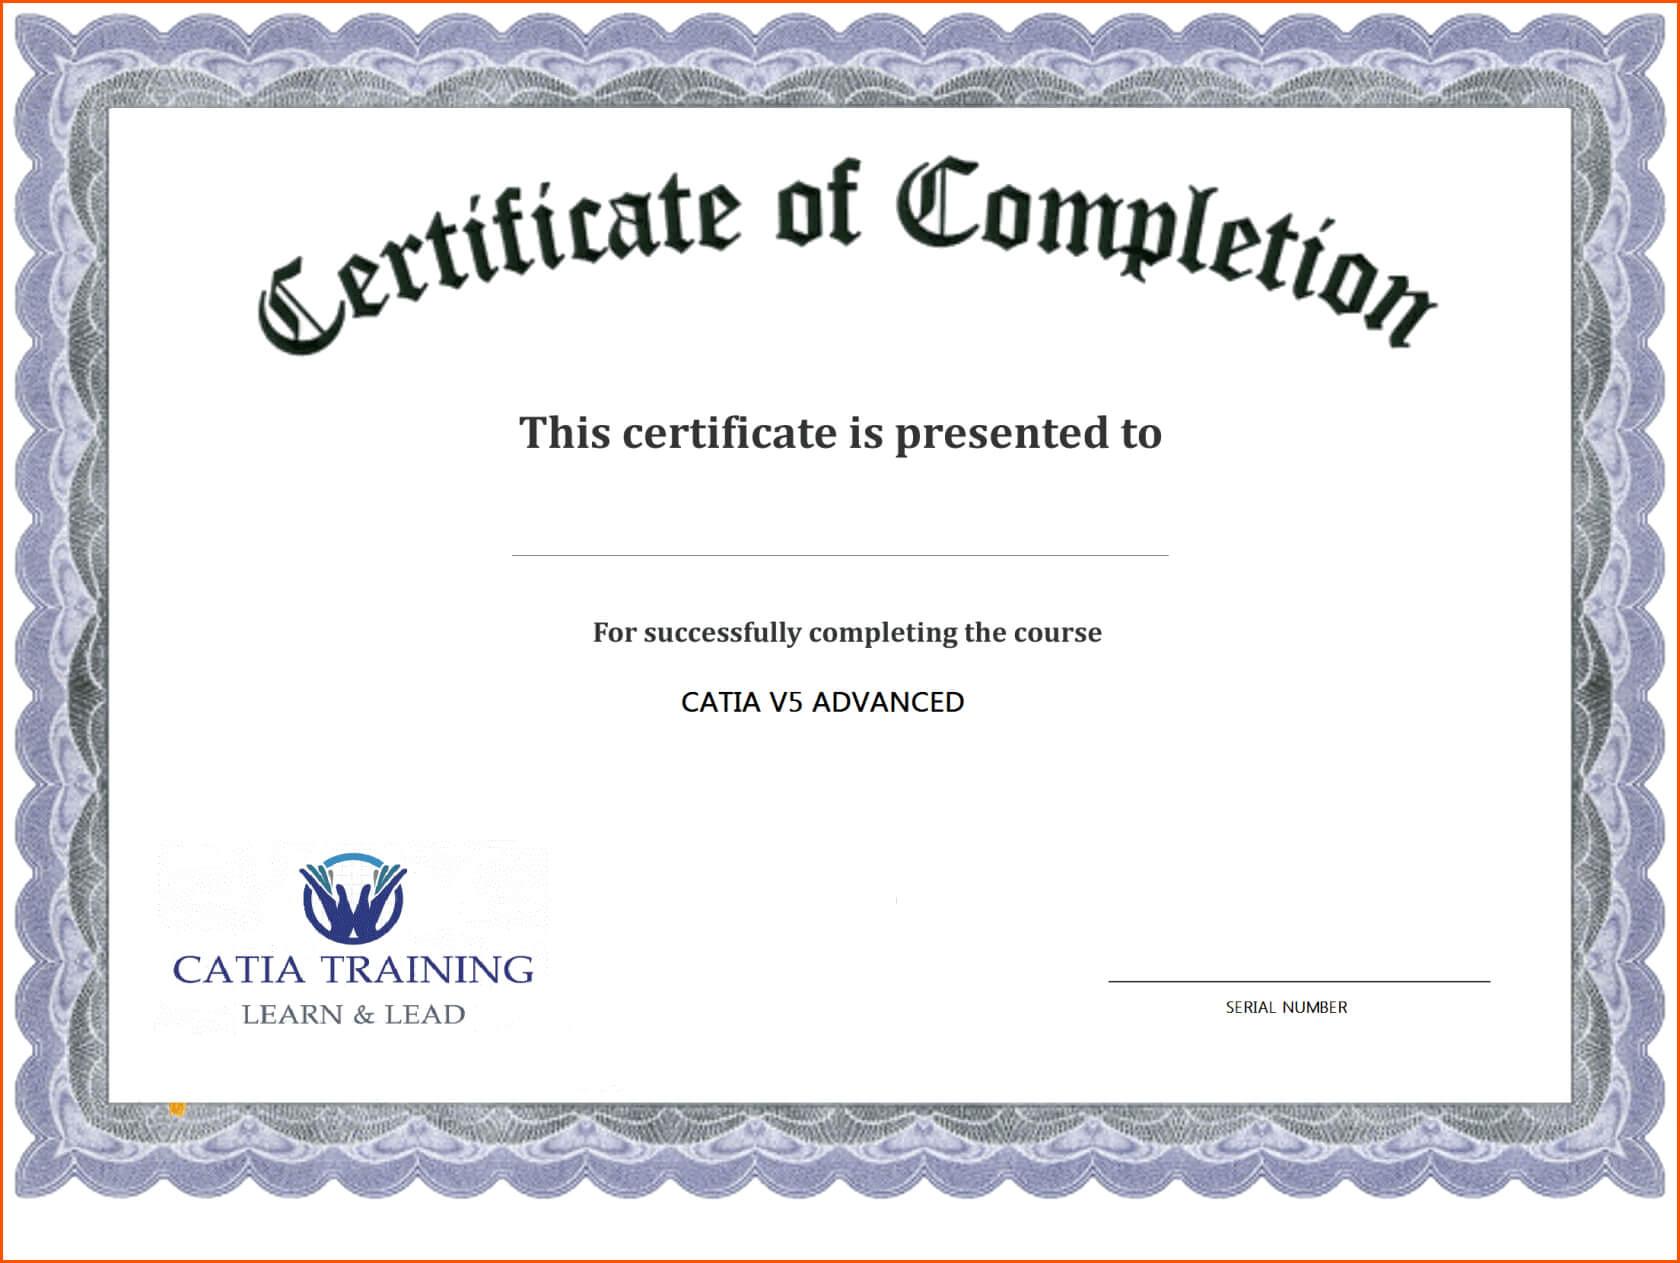 Certificate Template Free Printable - Free Download   Free Inside Blank Certificate Templates Free Download